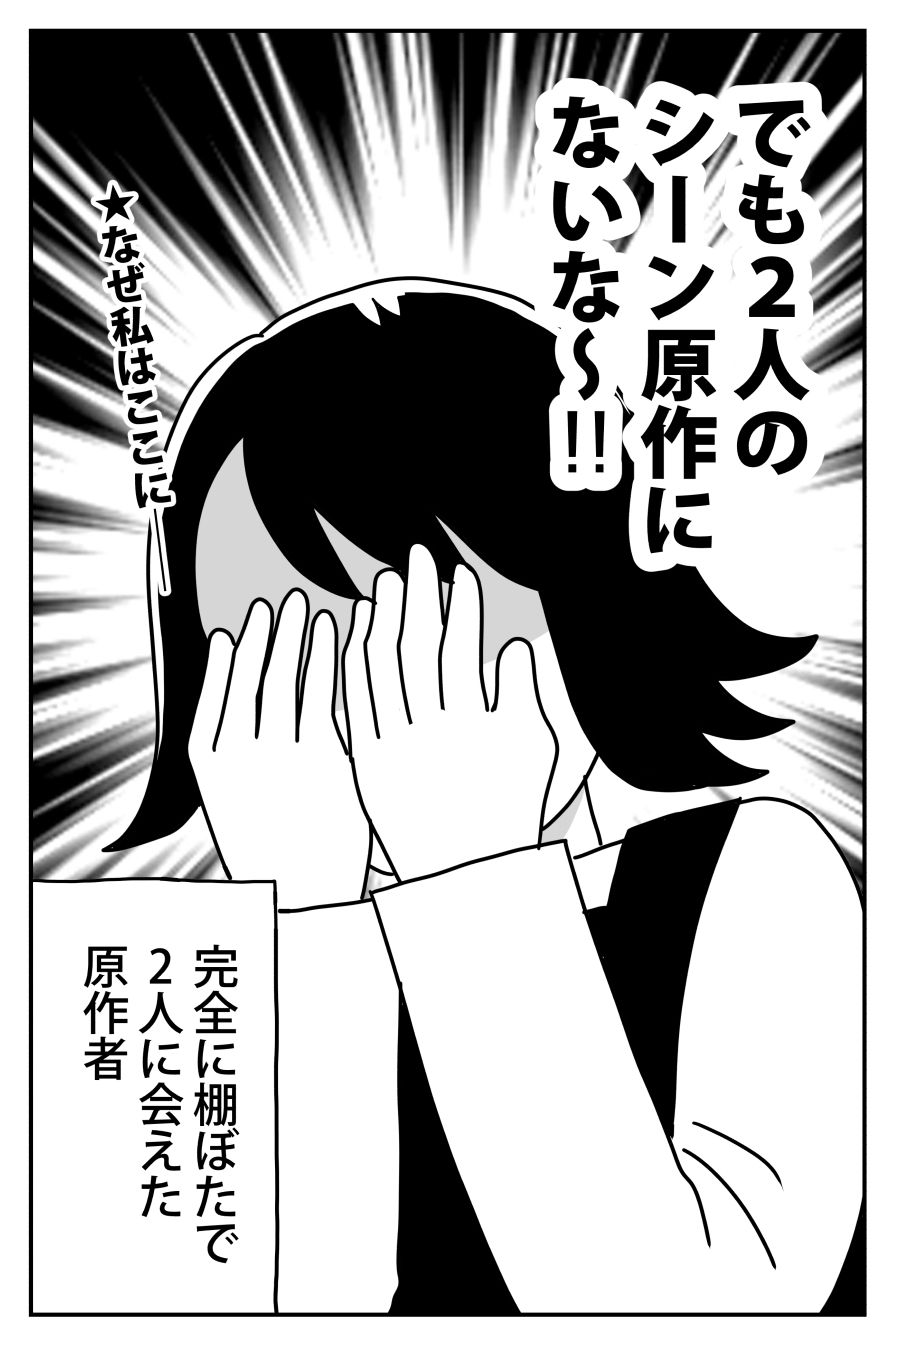 f:id:kanemotonomukuu:20200210172044j:plain